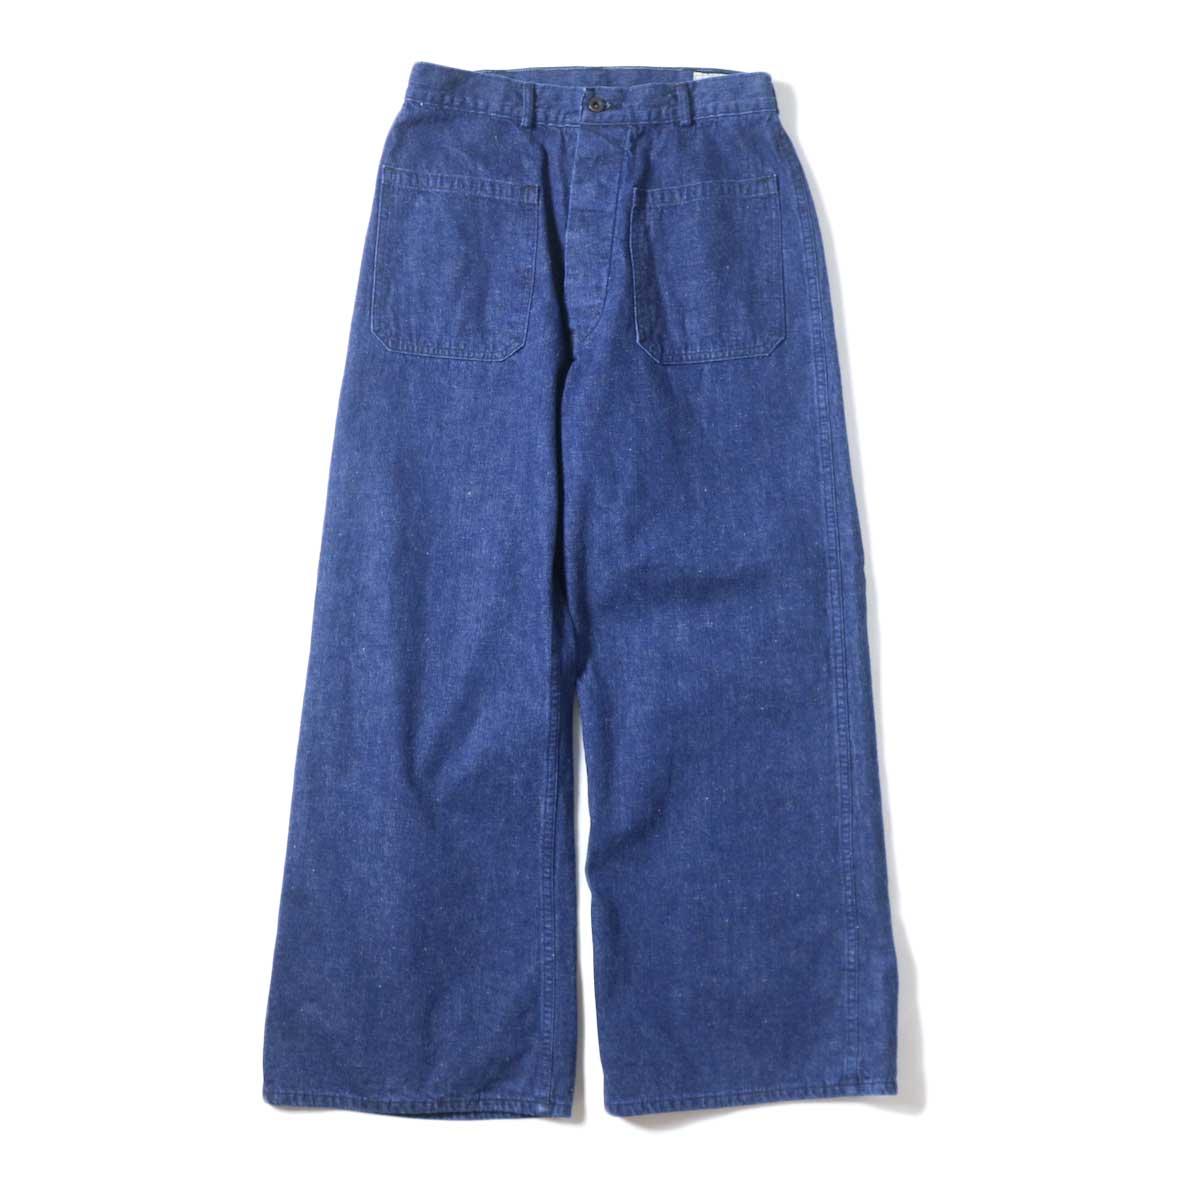 orSlow / US NAVY DENIM FLARE PANTS